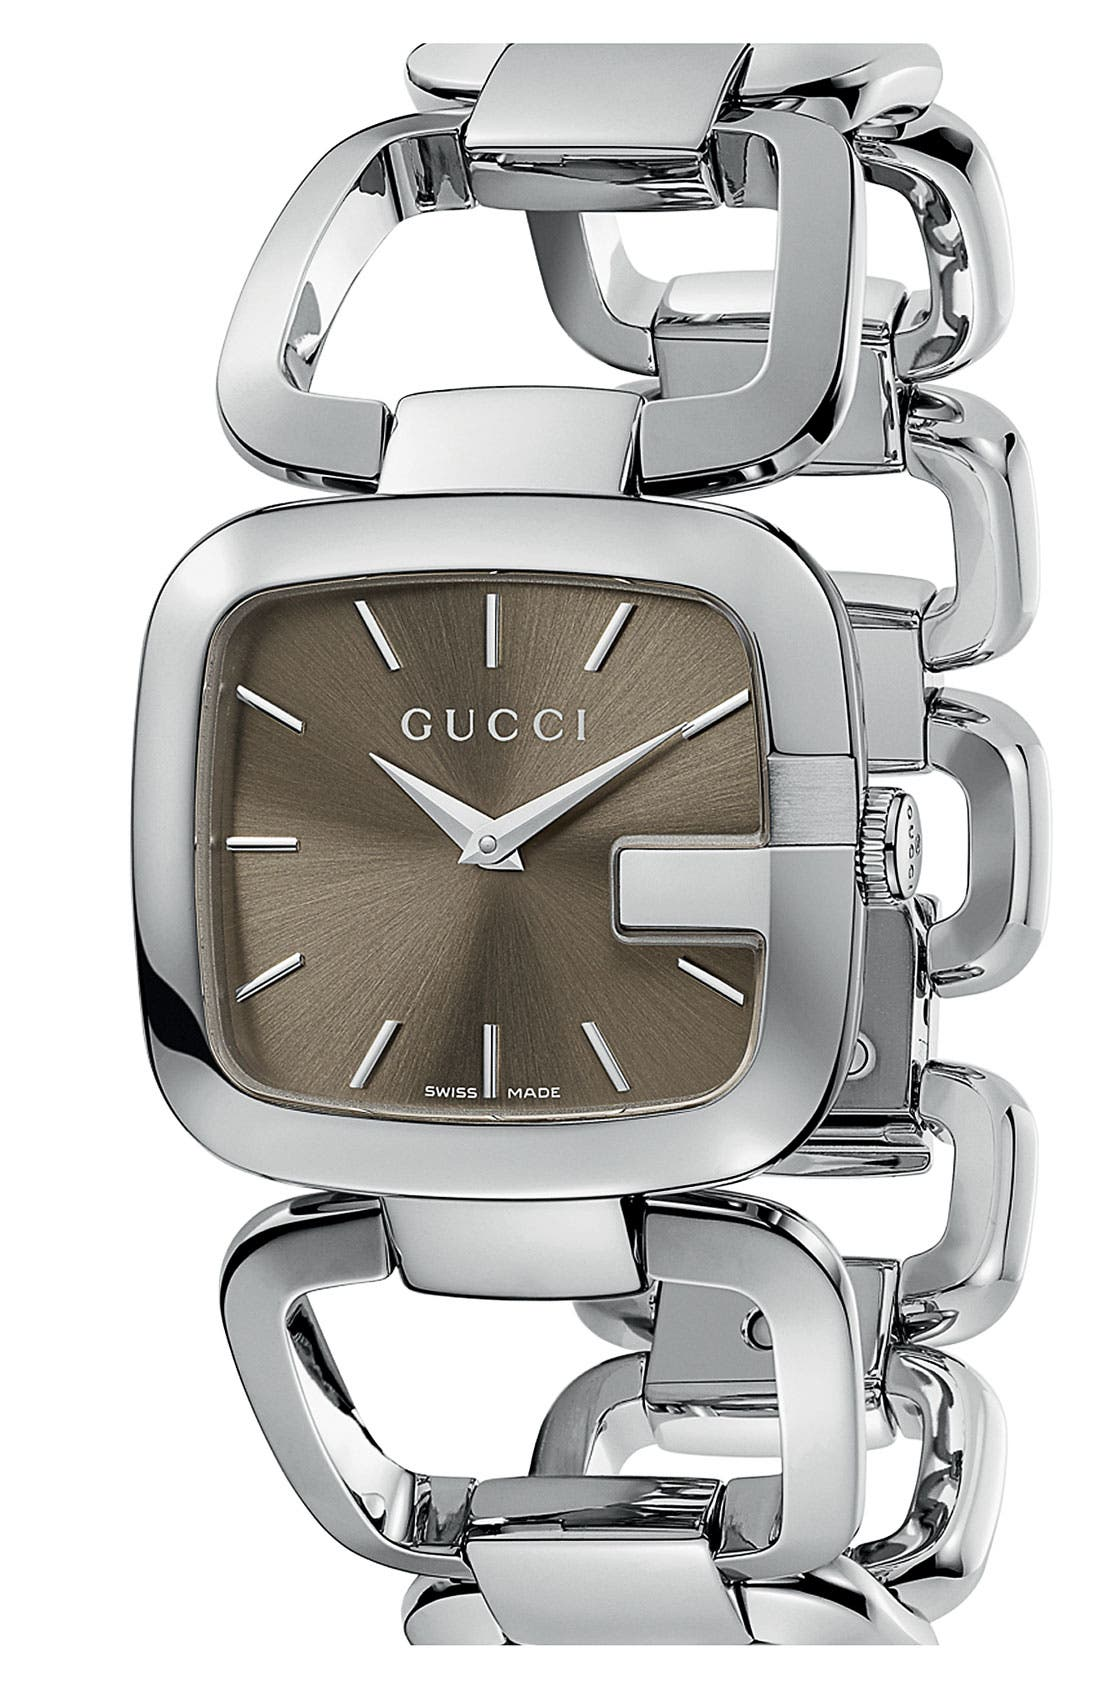 Main Image - Gucci 'G-Gucci' Bracelet Watch, 32mm x 30mm